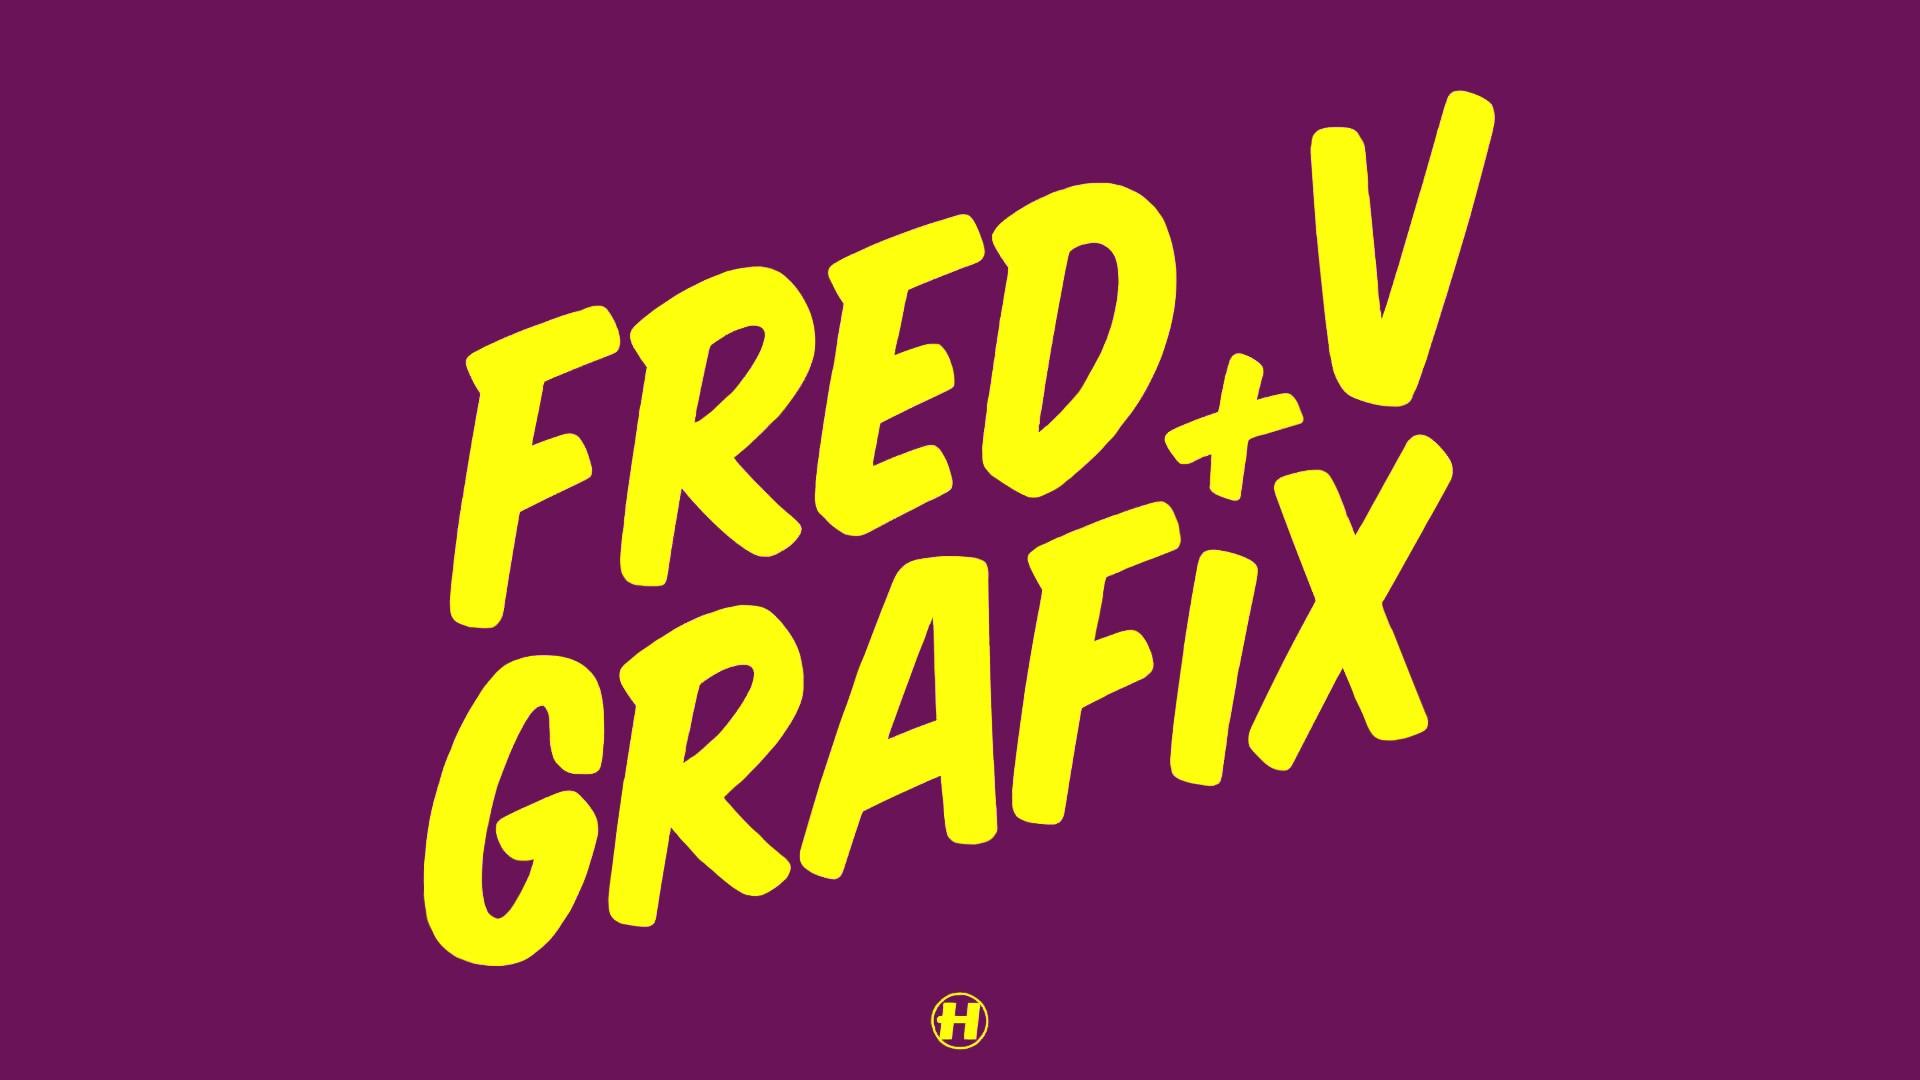 General 1920x1080 Fred V & Grafix liquid drum and bass music